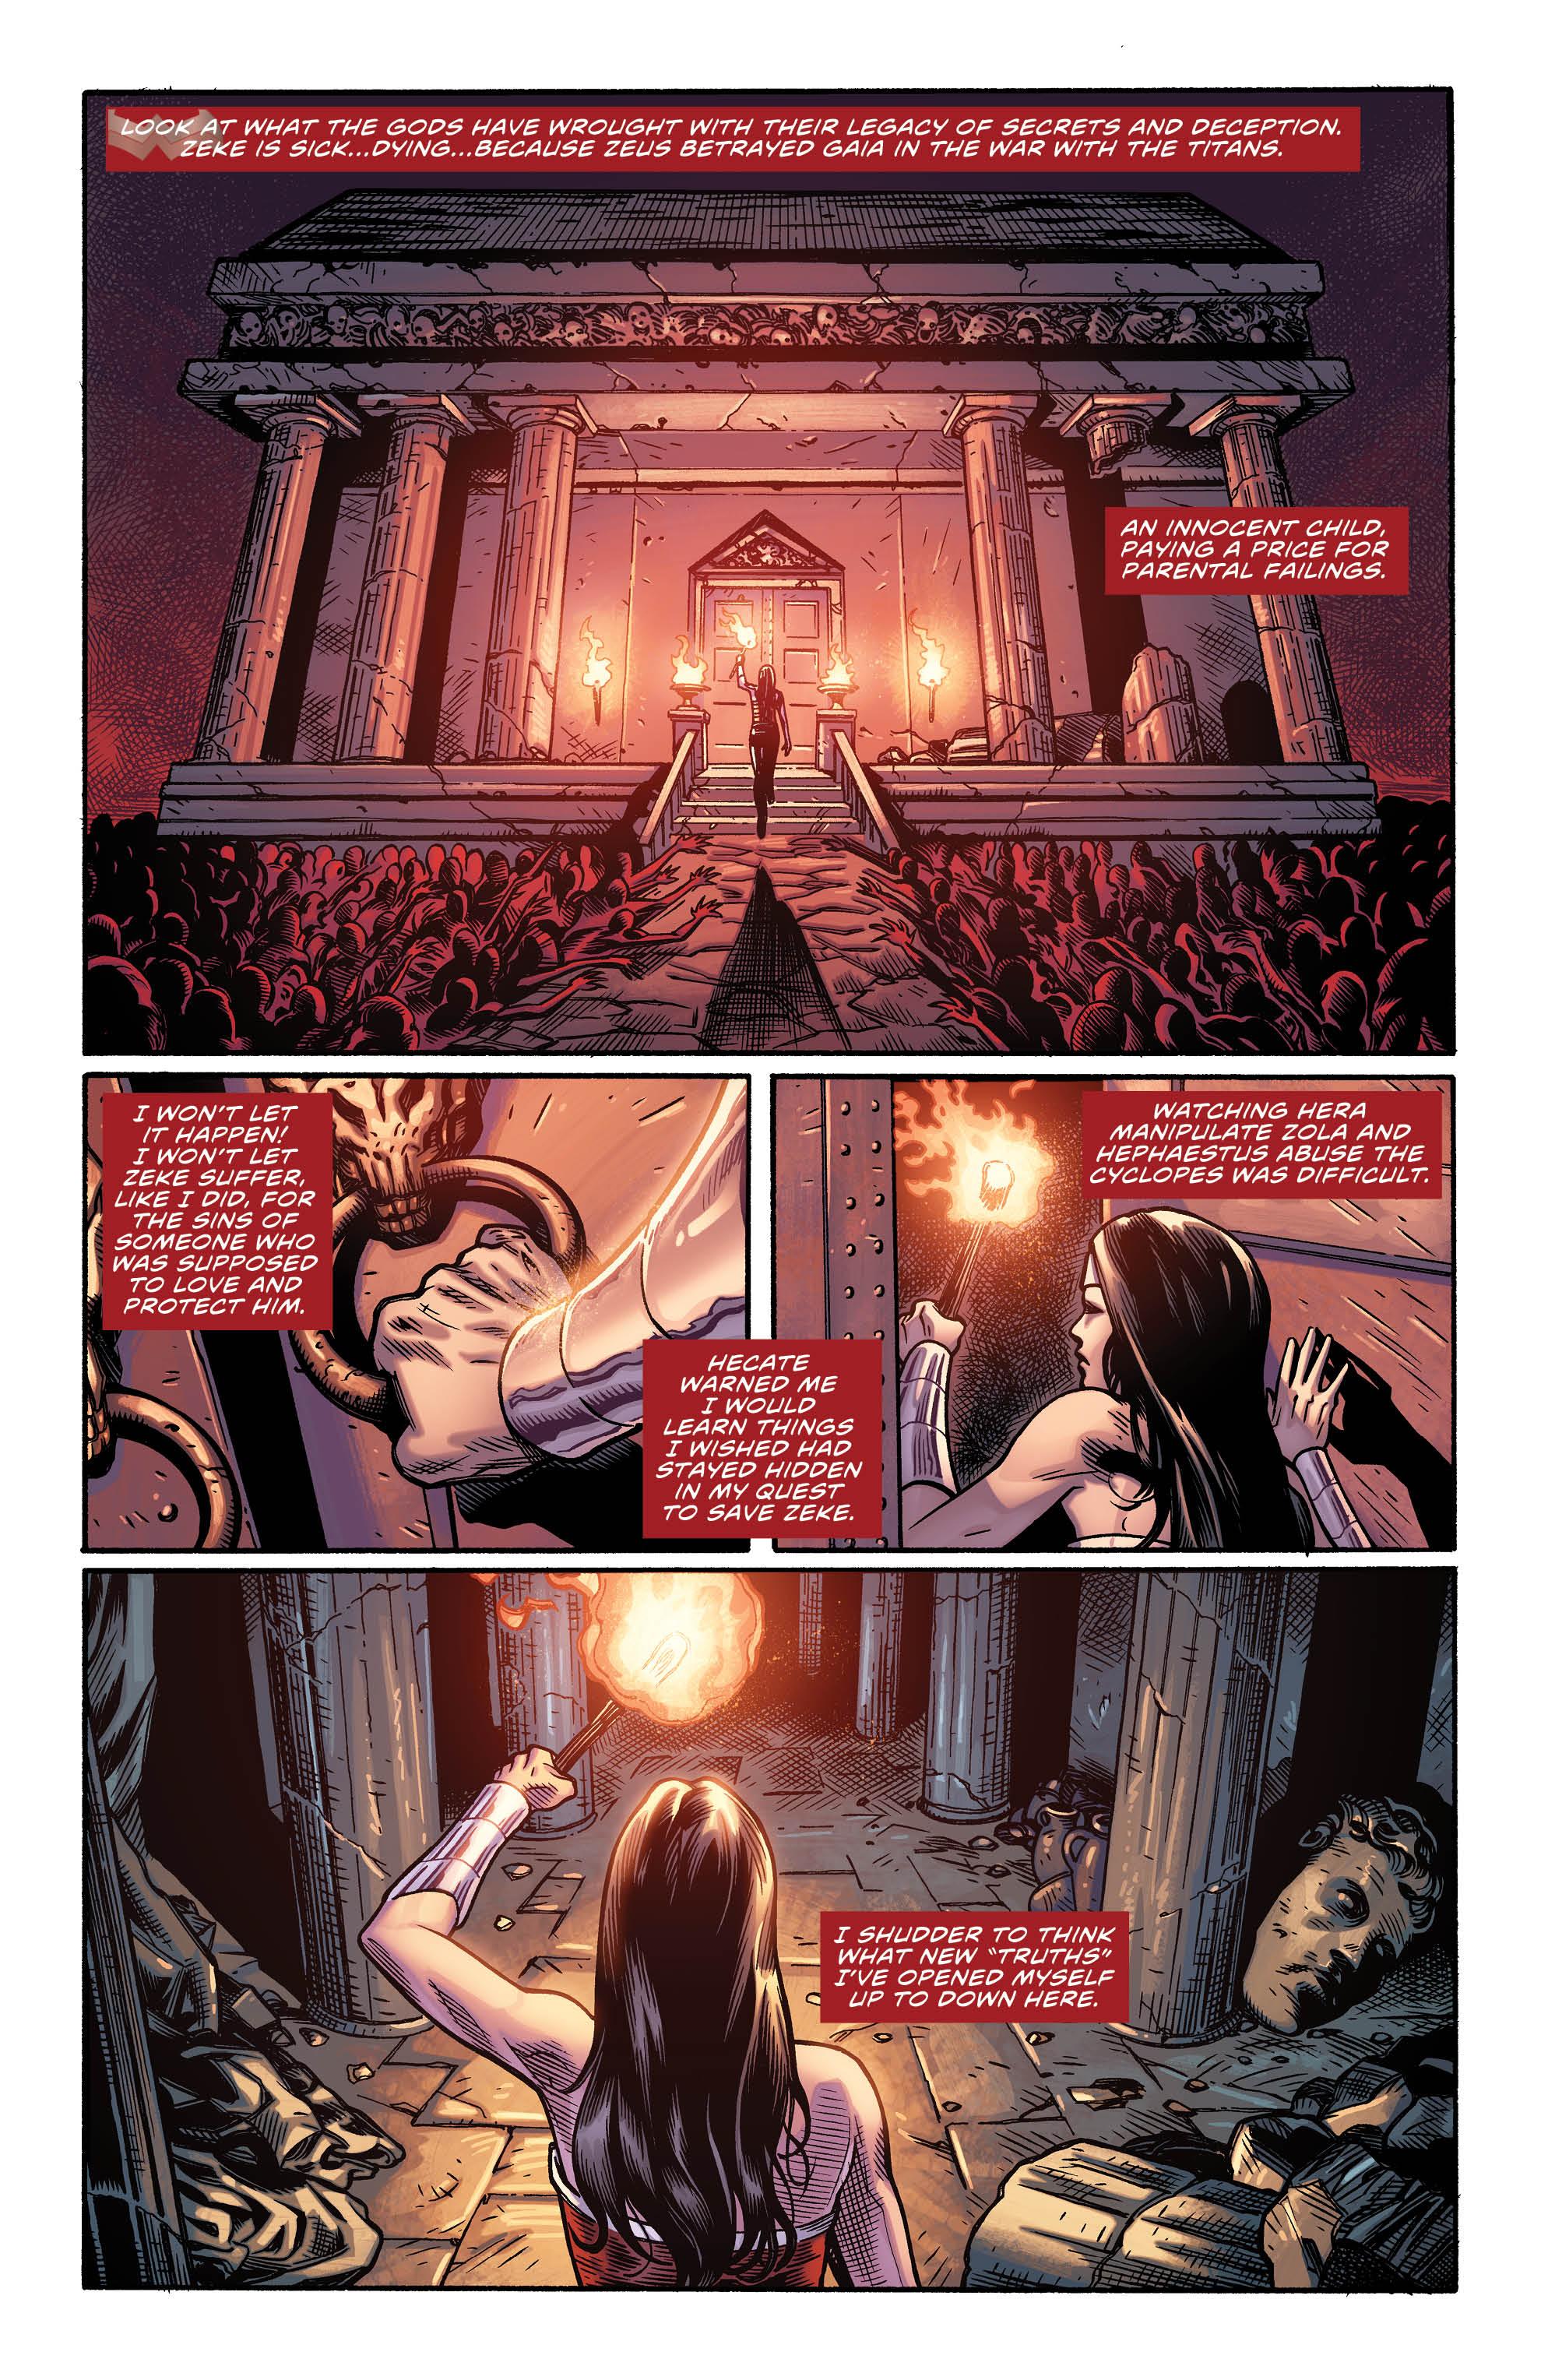 WONDER WOMAN #51 page 4